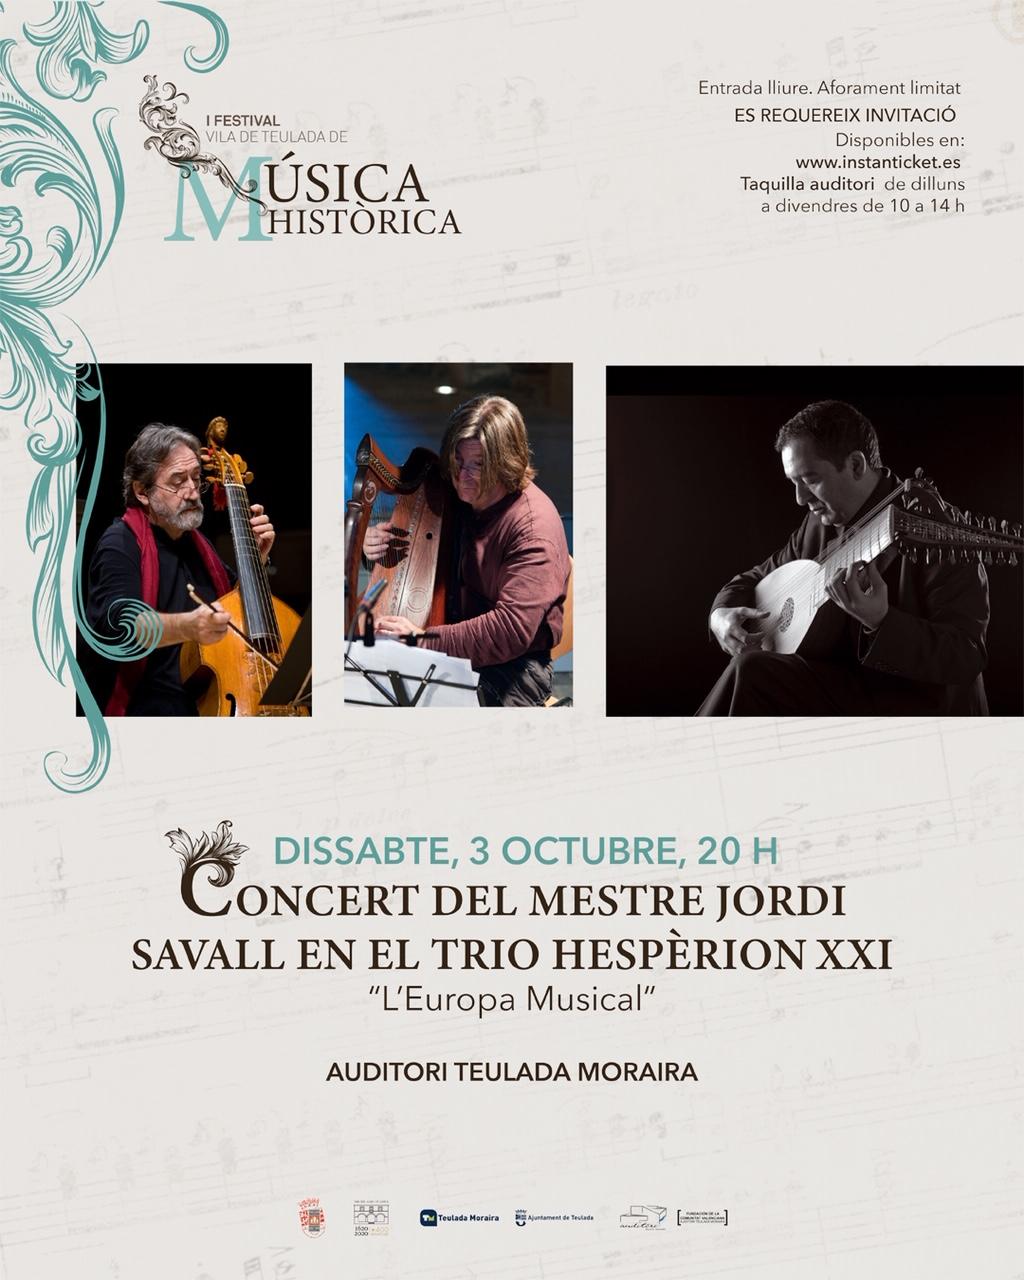 musicahistorica-trio